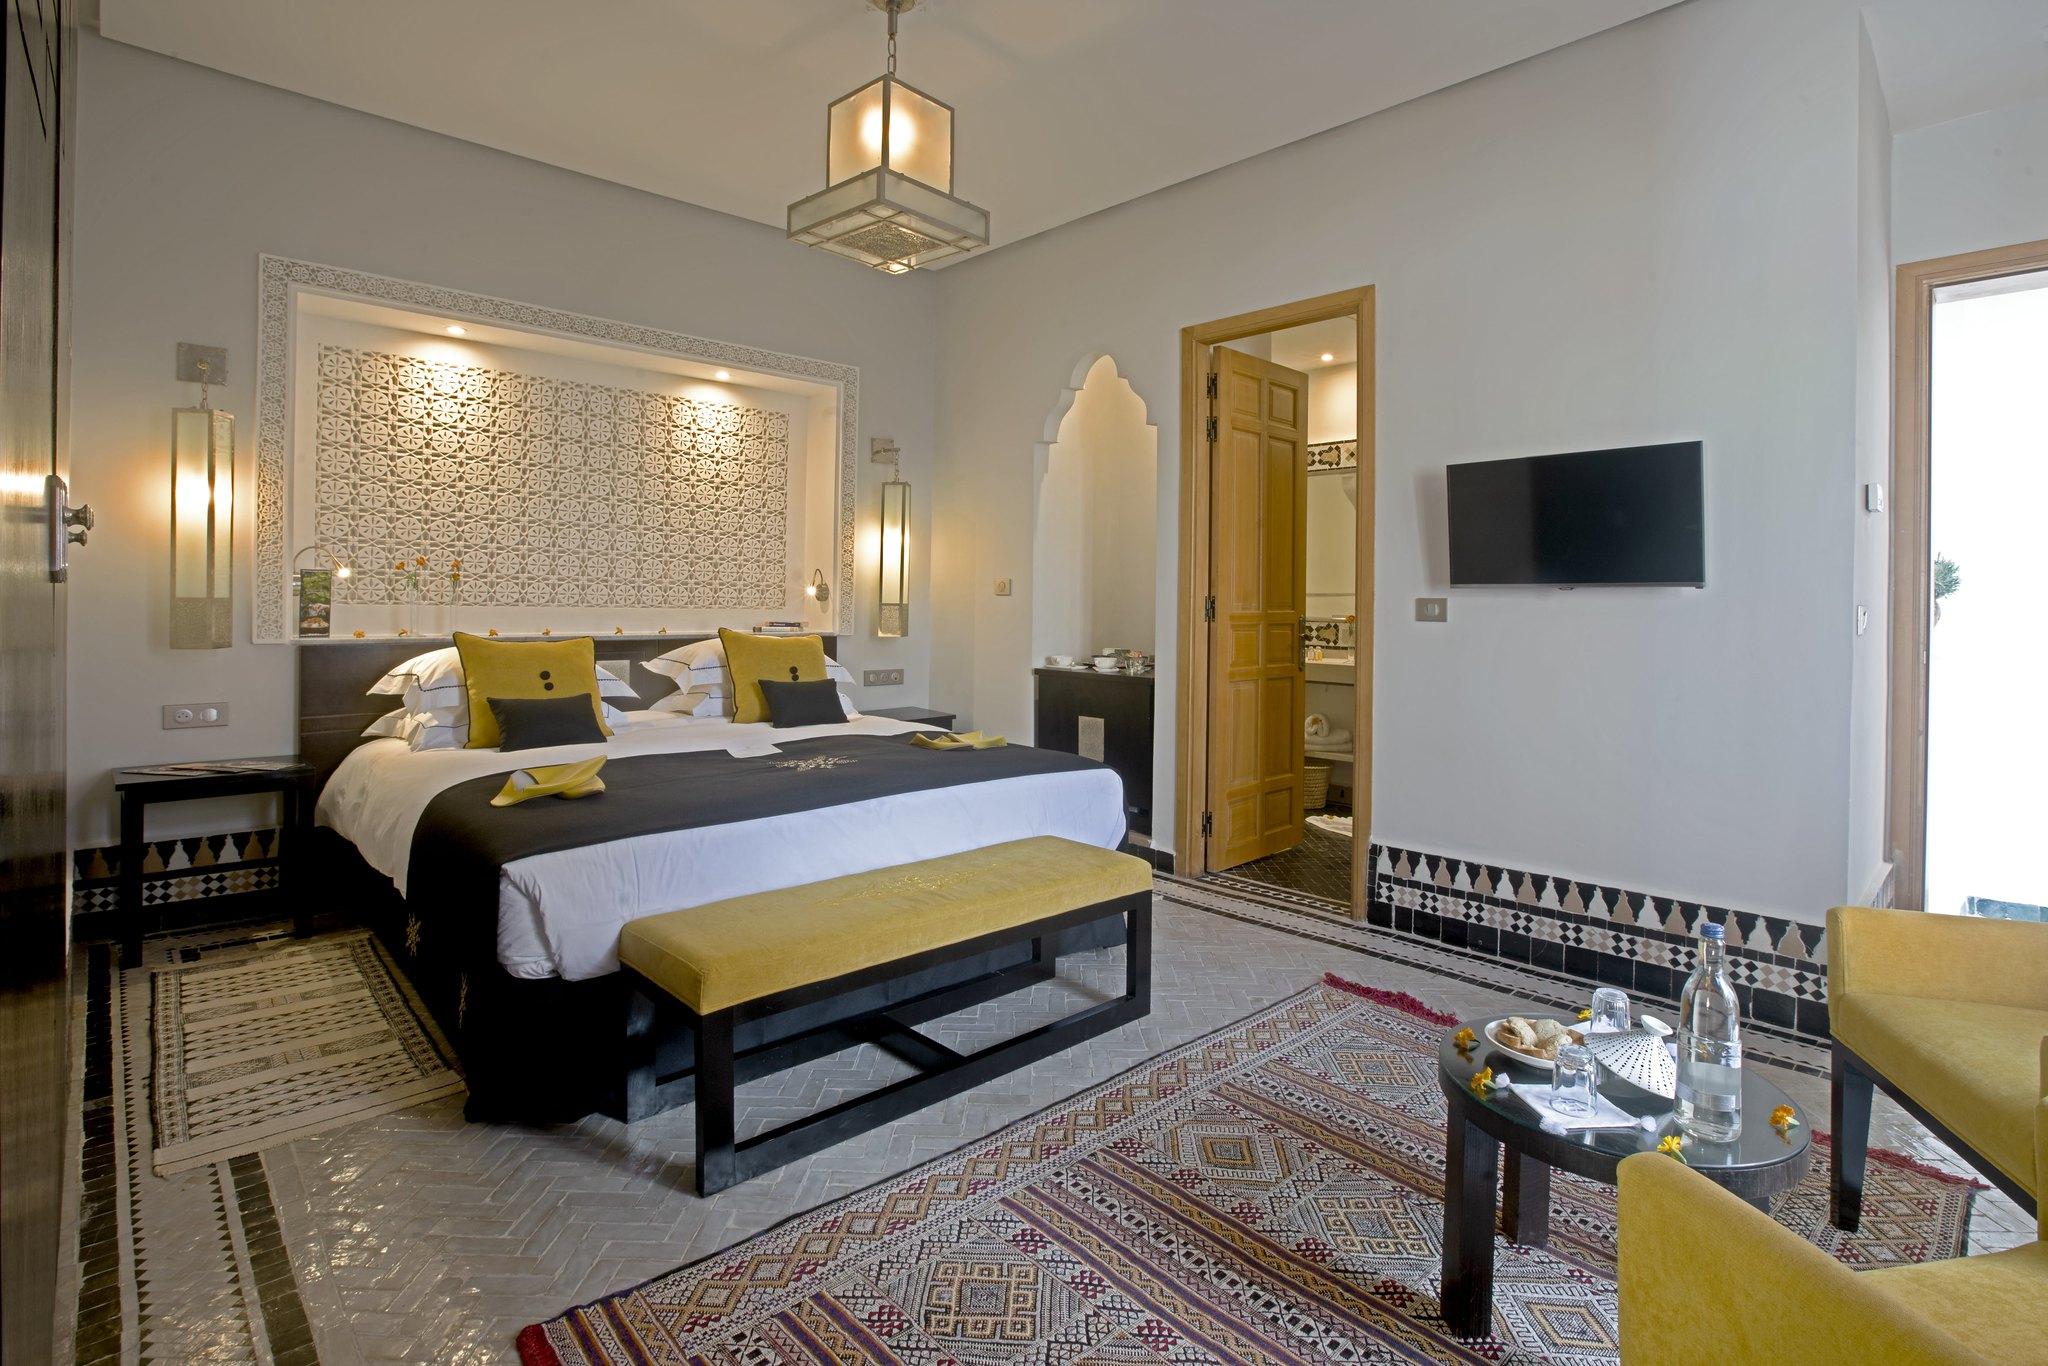 Palais Amani Hotel, Fez